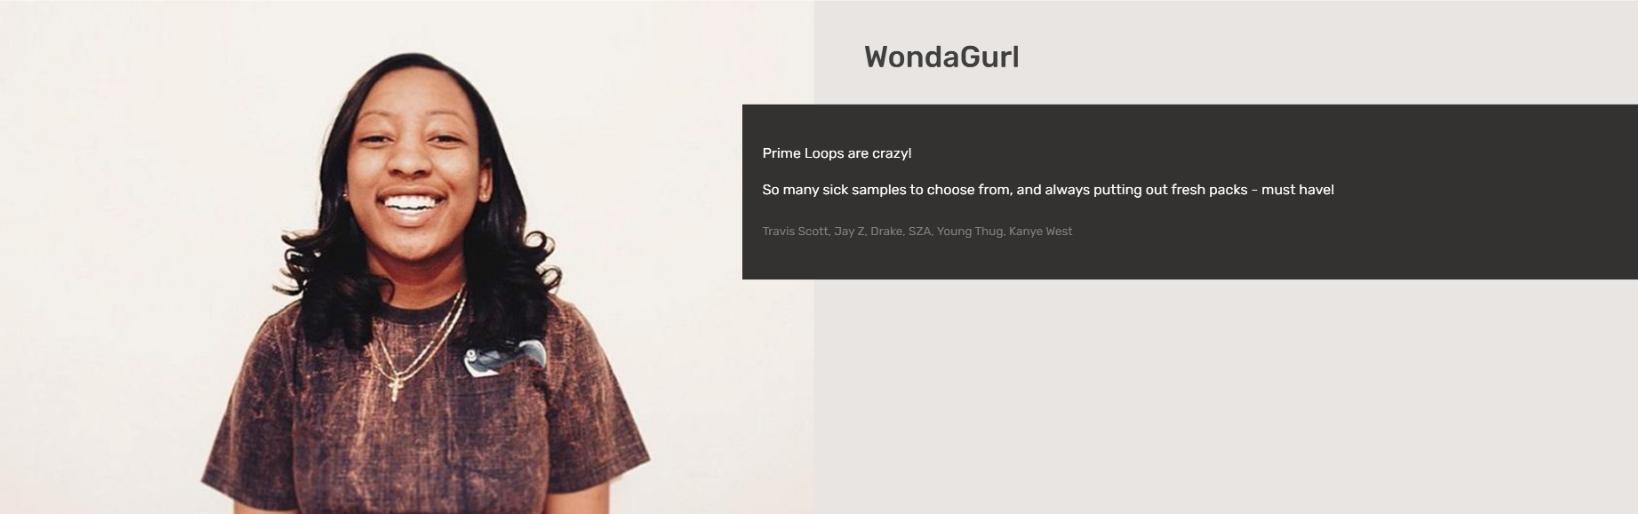 Wondagurl   Testimonial